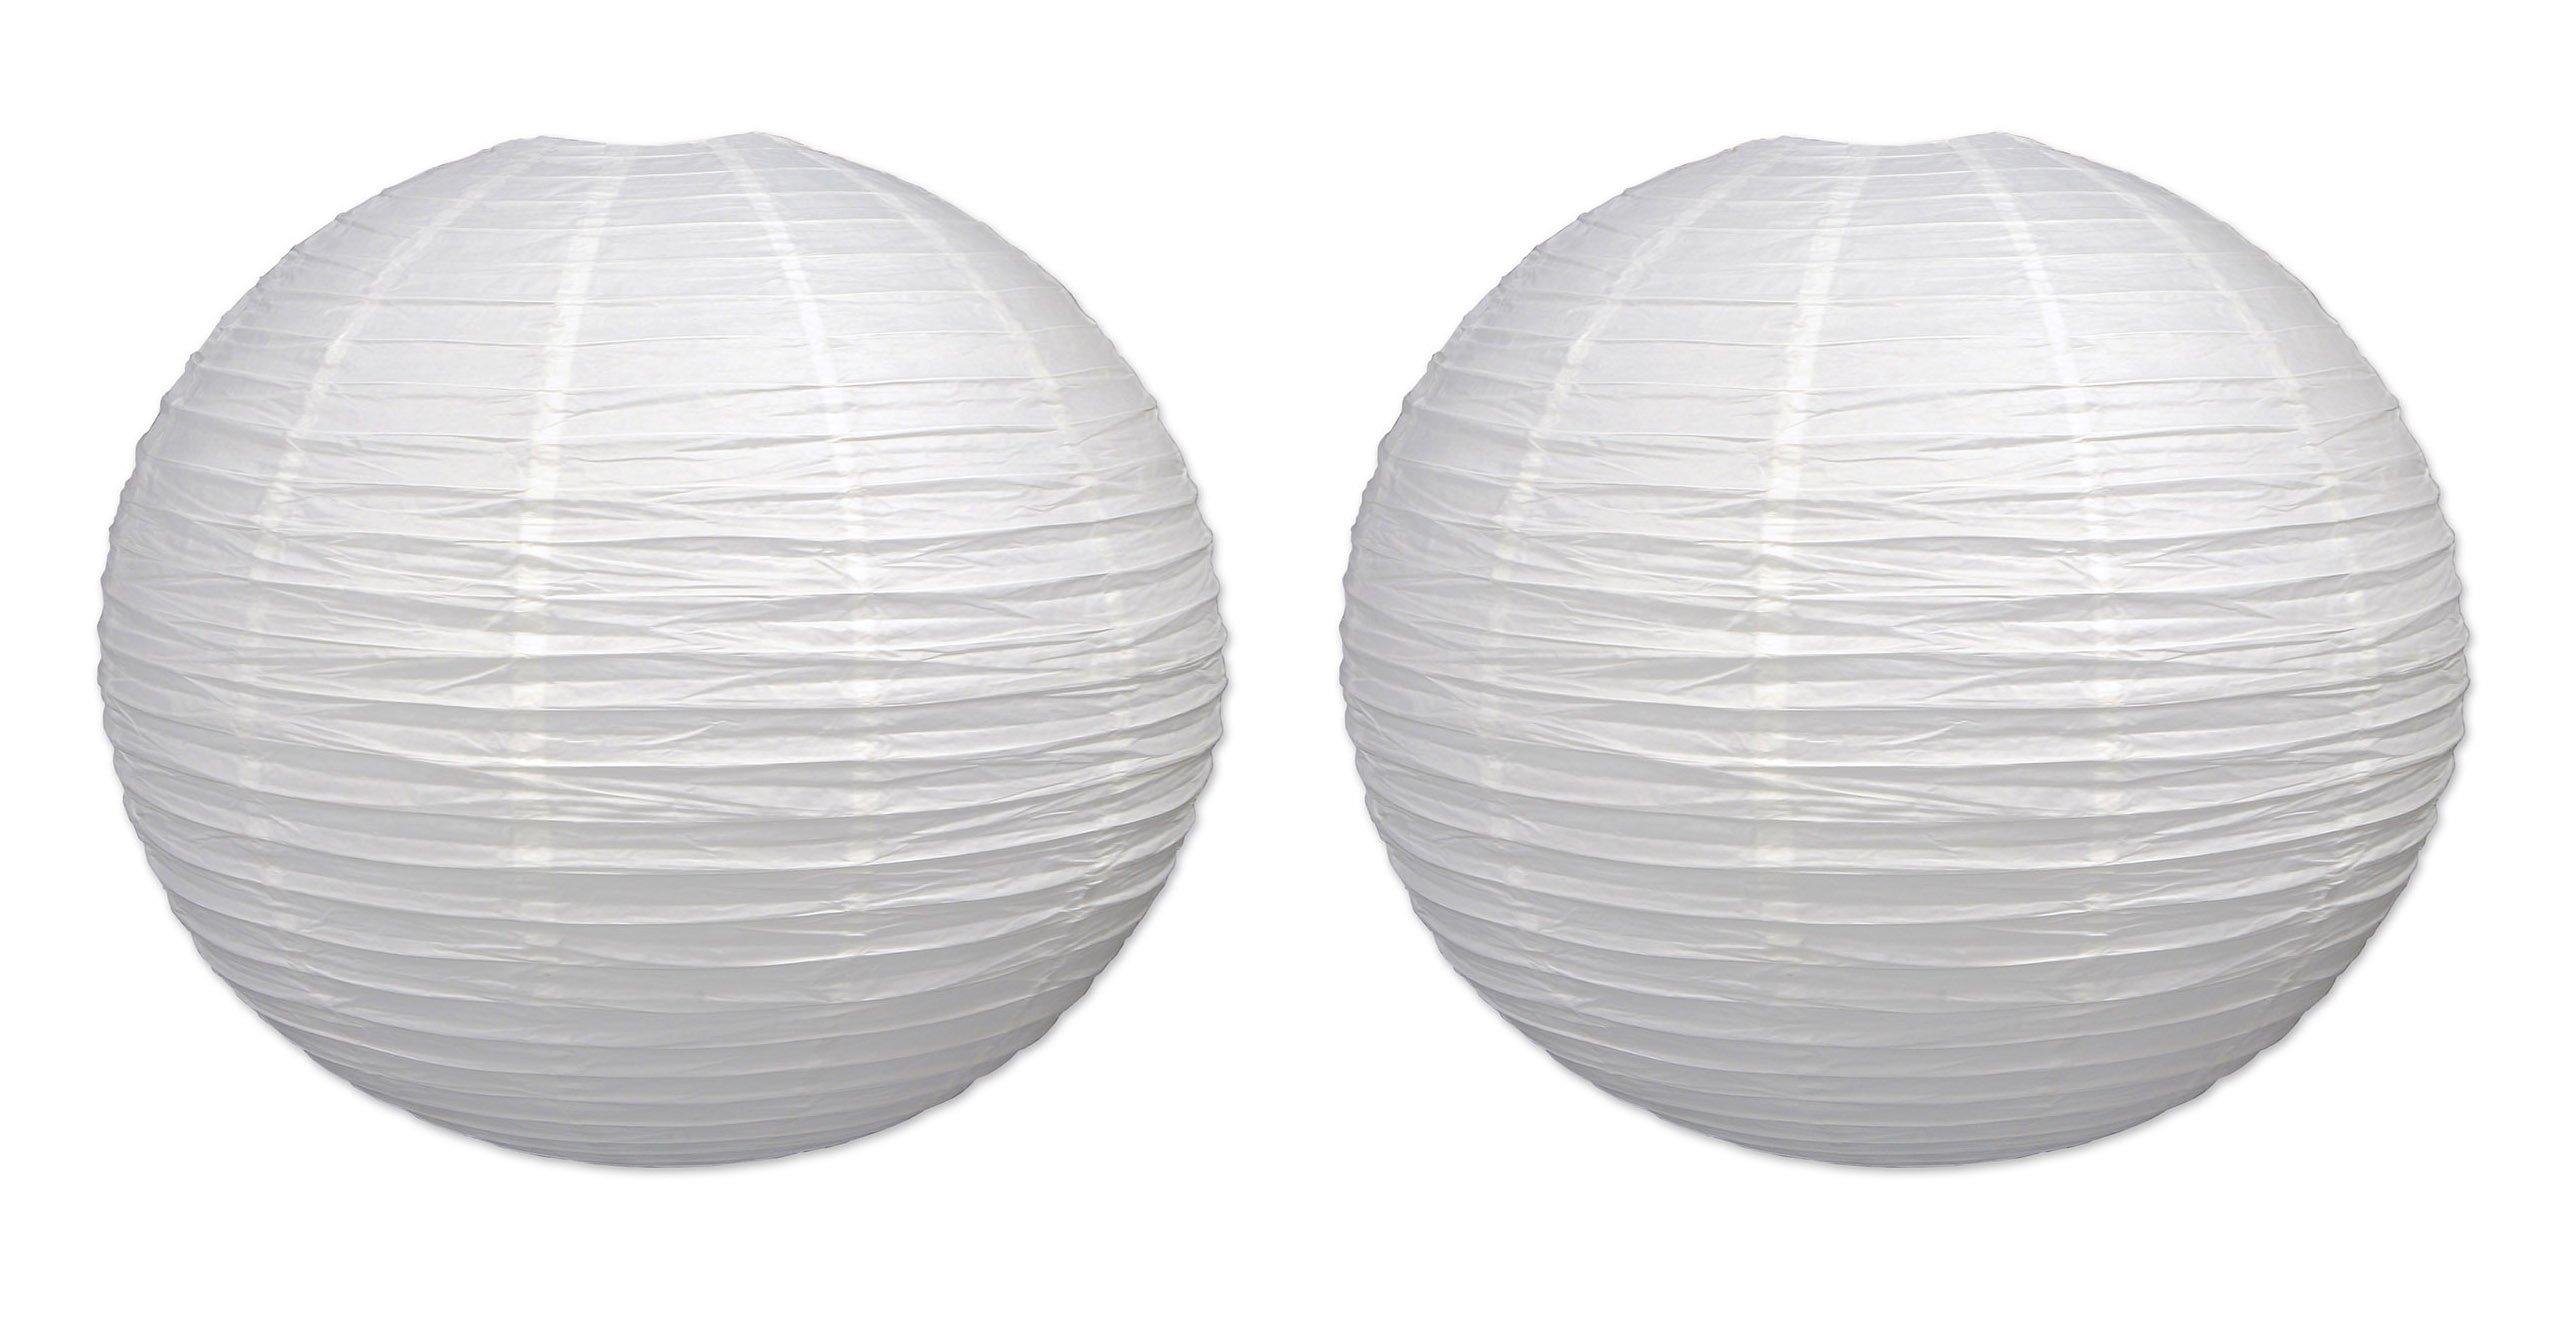 Beistle S54545-WAZ2 jumbo paper lantern, White